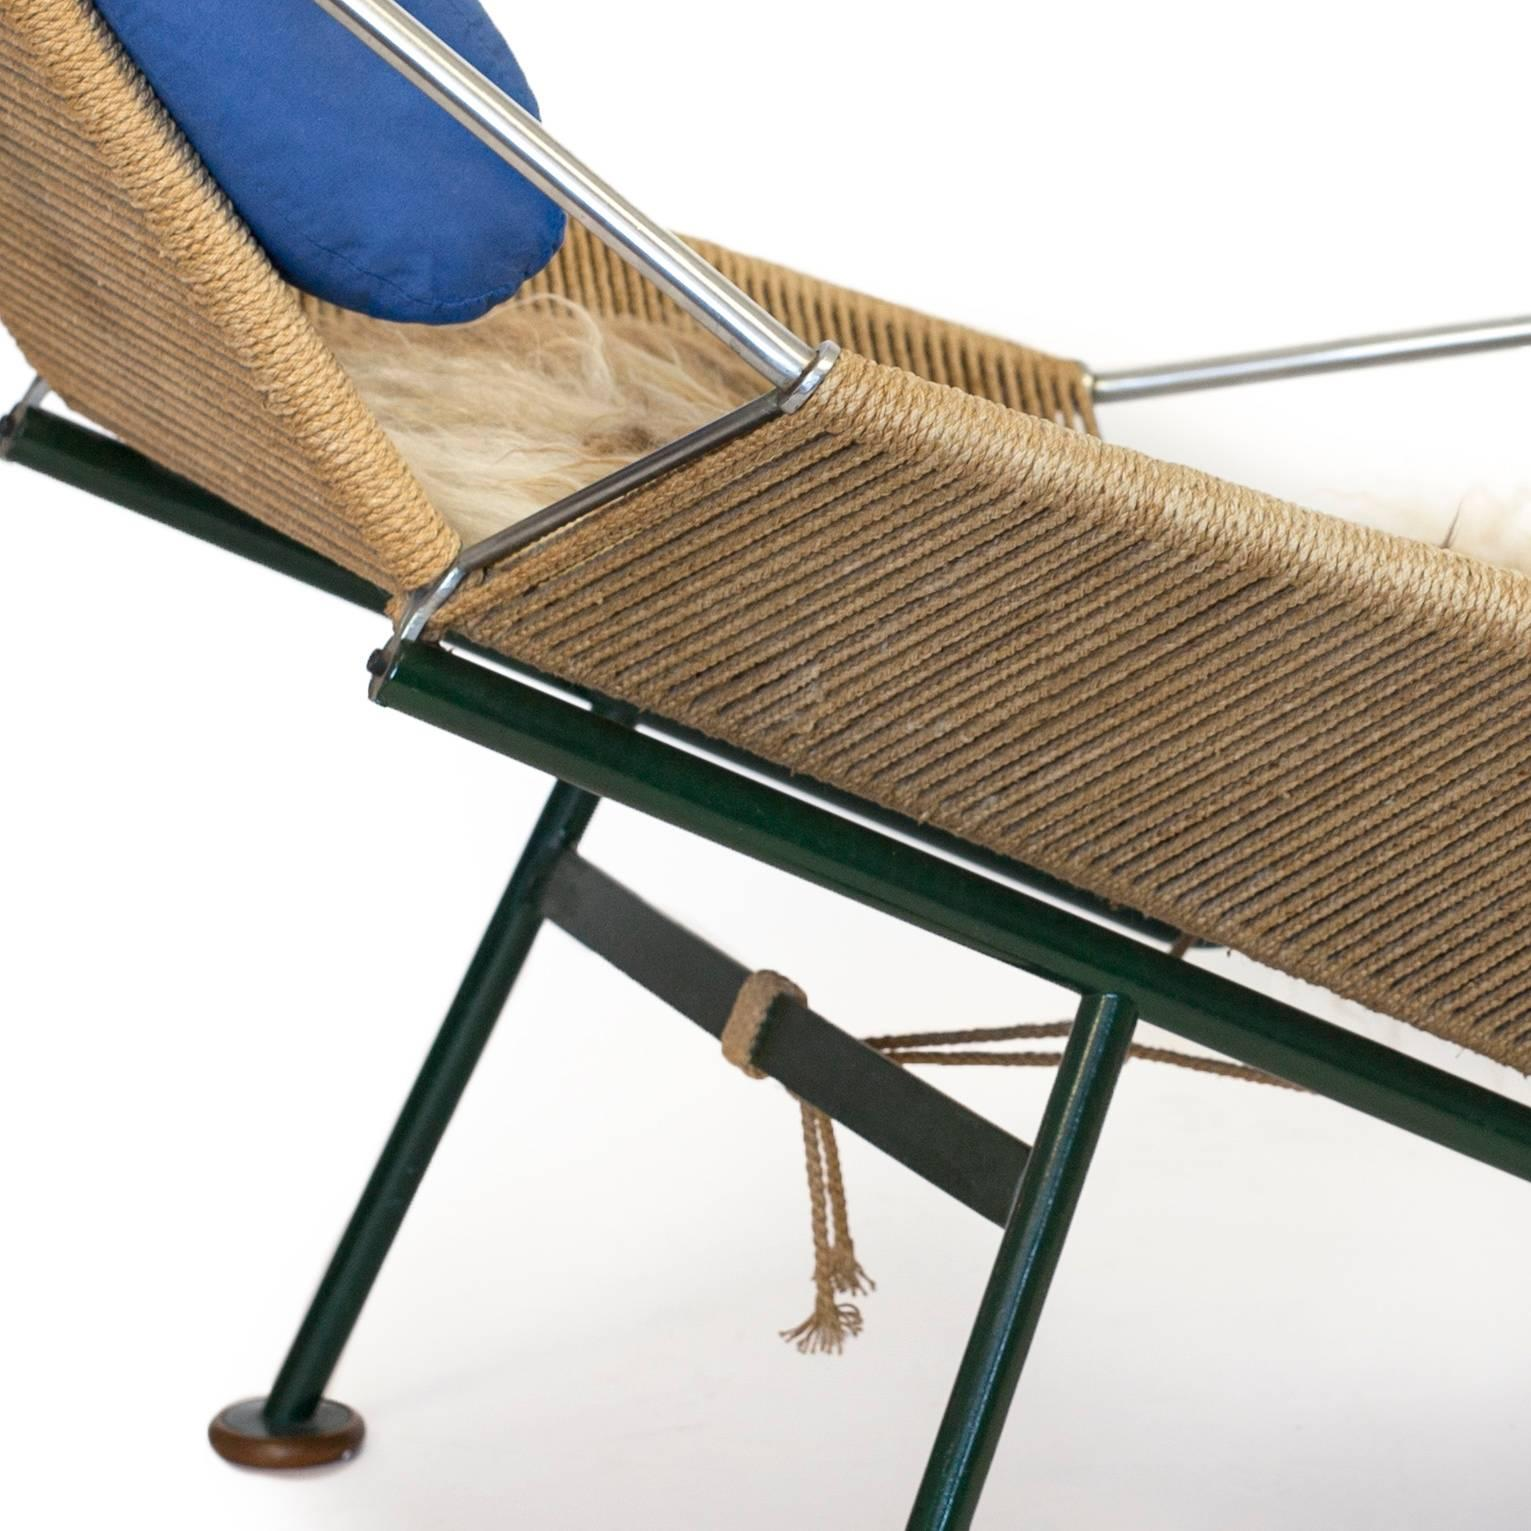 Hans J. Wegner Halyard Chair, GETAMA, 1950 At 1stdibs